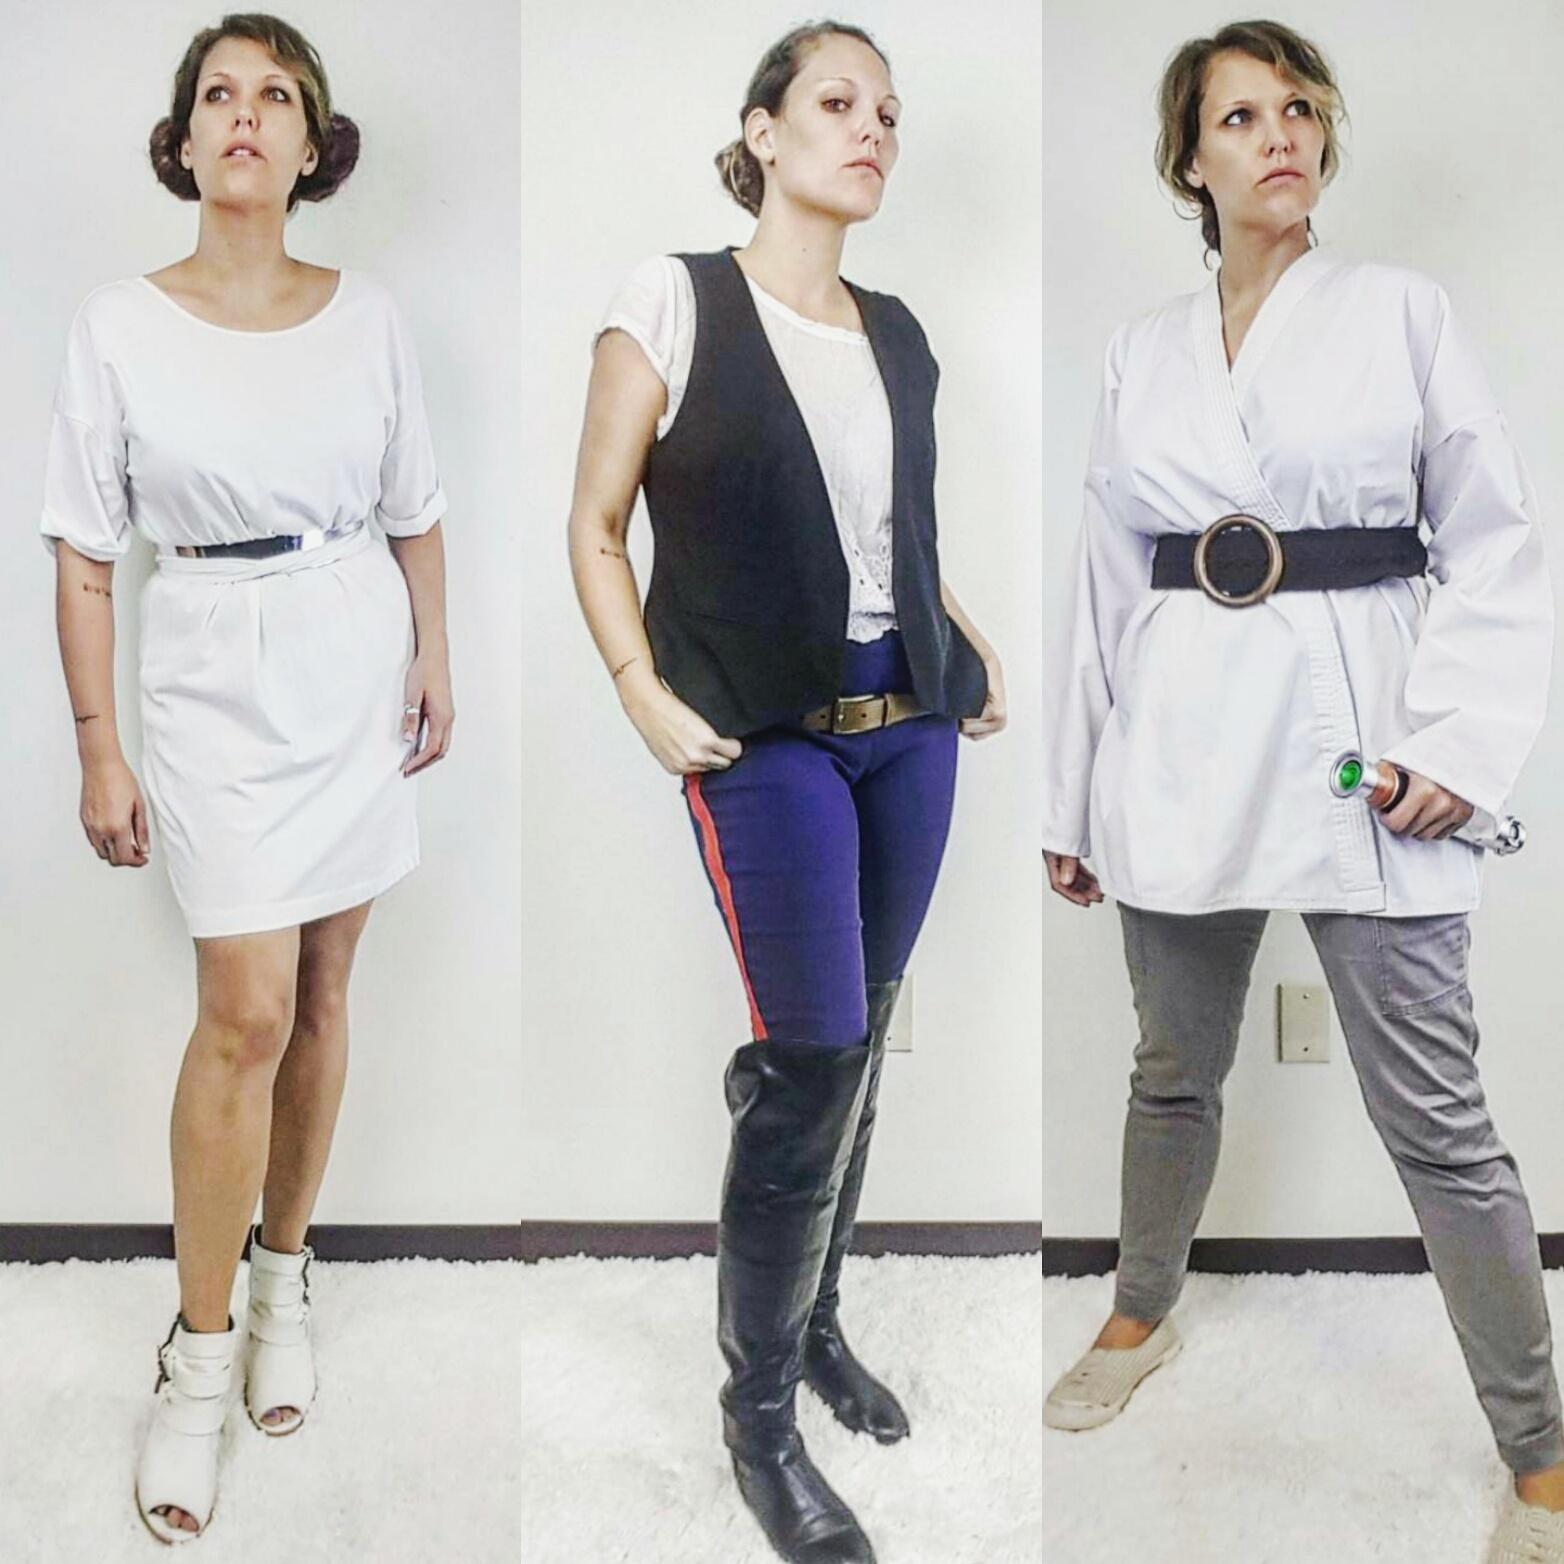 Thrift Store Cosplay Day 31: Star Wars Princess Leia, Han Solo, Luke Skywalker fashion blog post